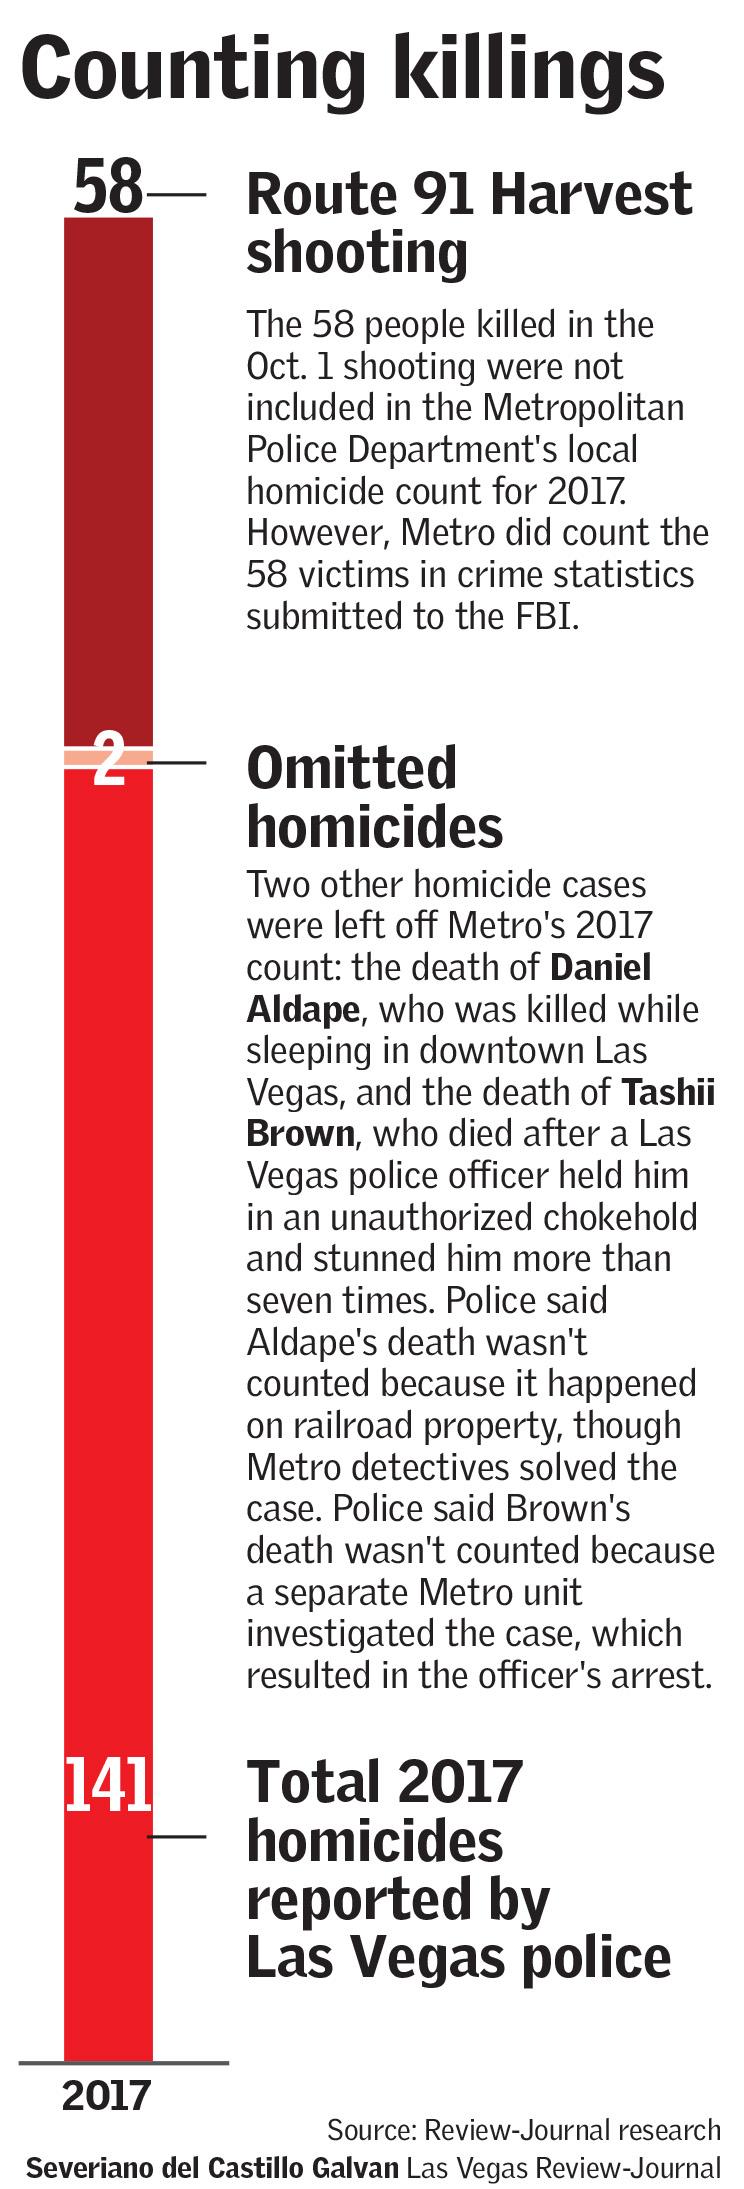 Metro murder stats (Severiano del Castillo Galvãn/Las Vegas Review-Journal)